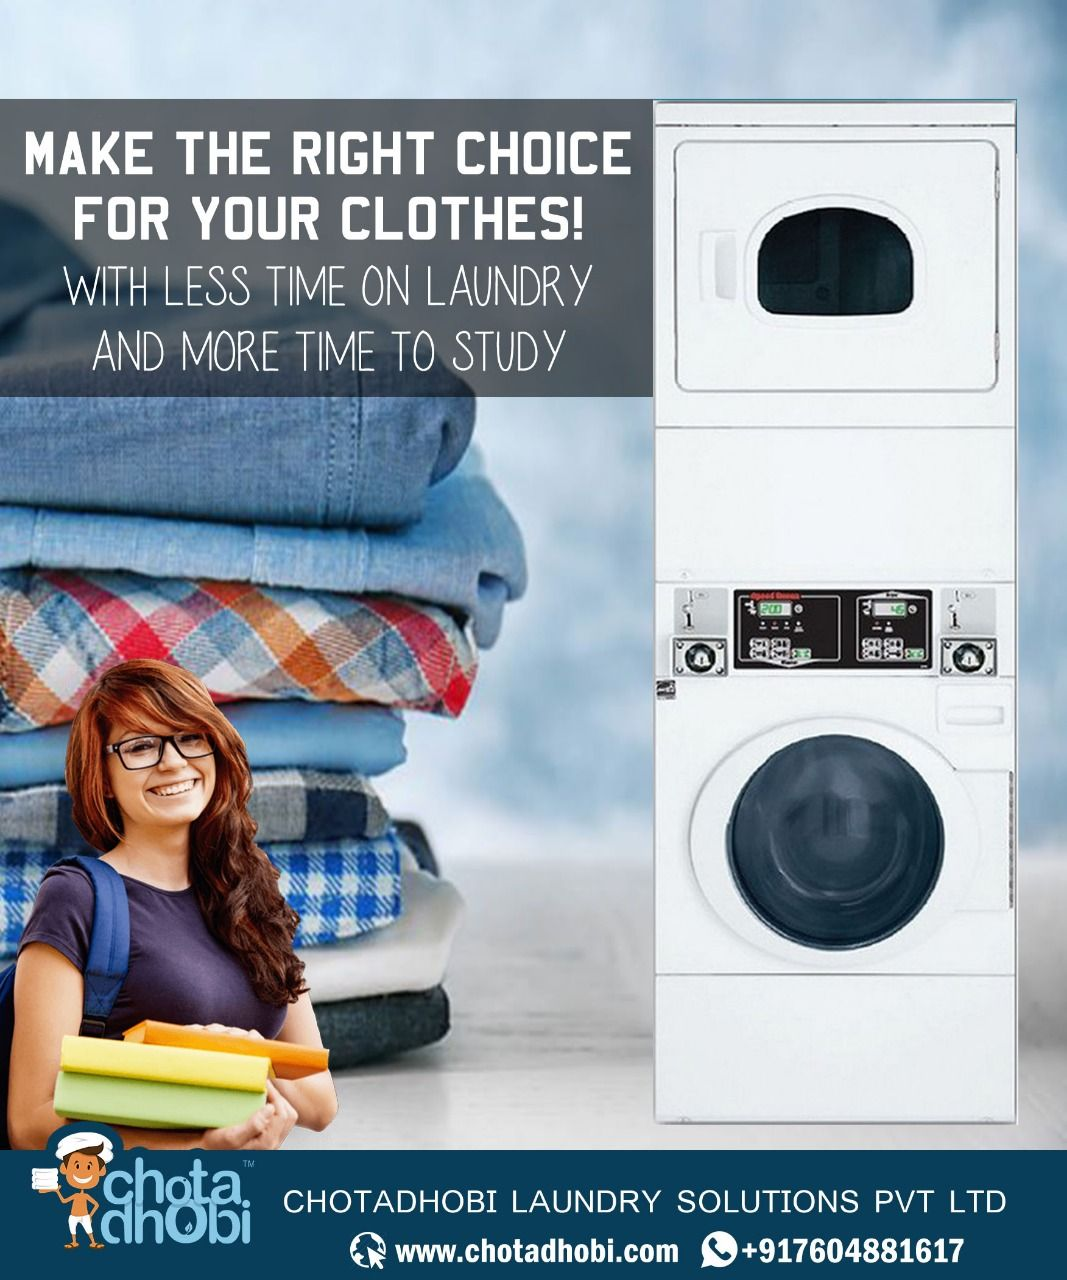 Get A Safe Hygienic Laundry Solution With Chotadhobi Com Call Us